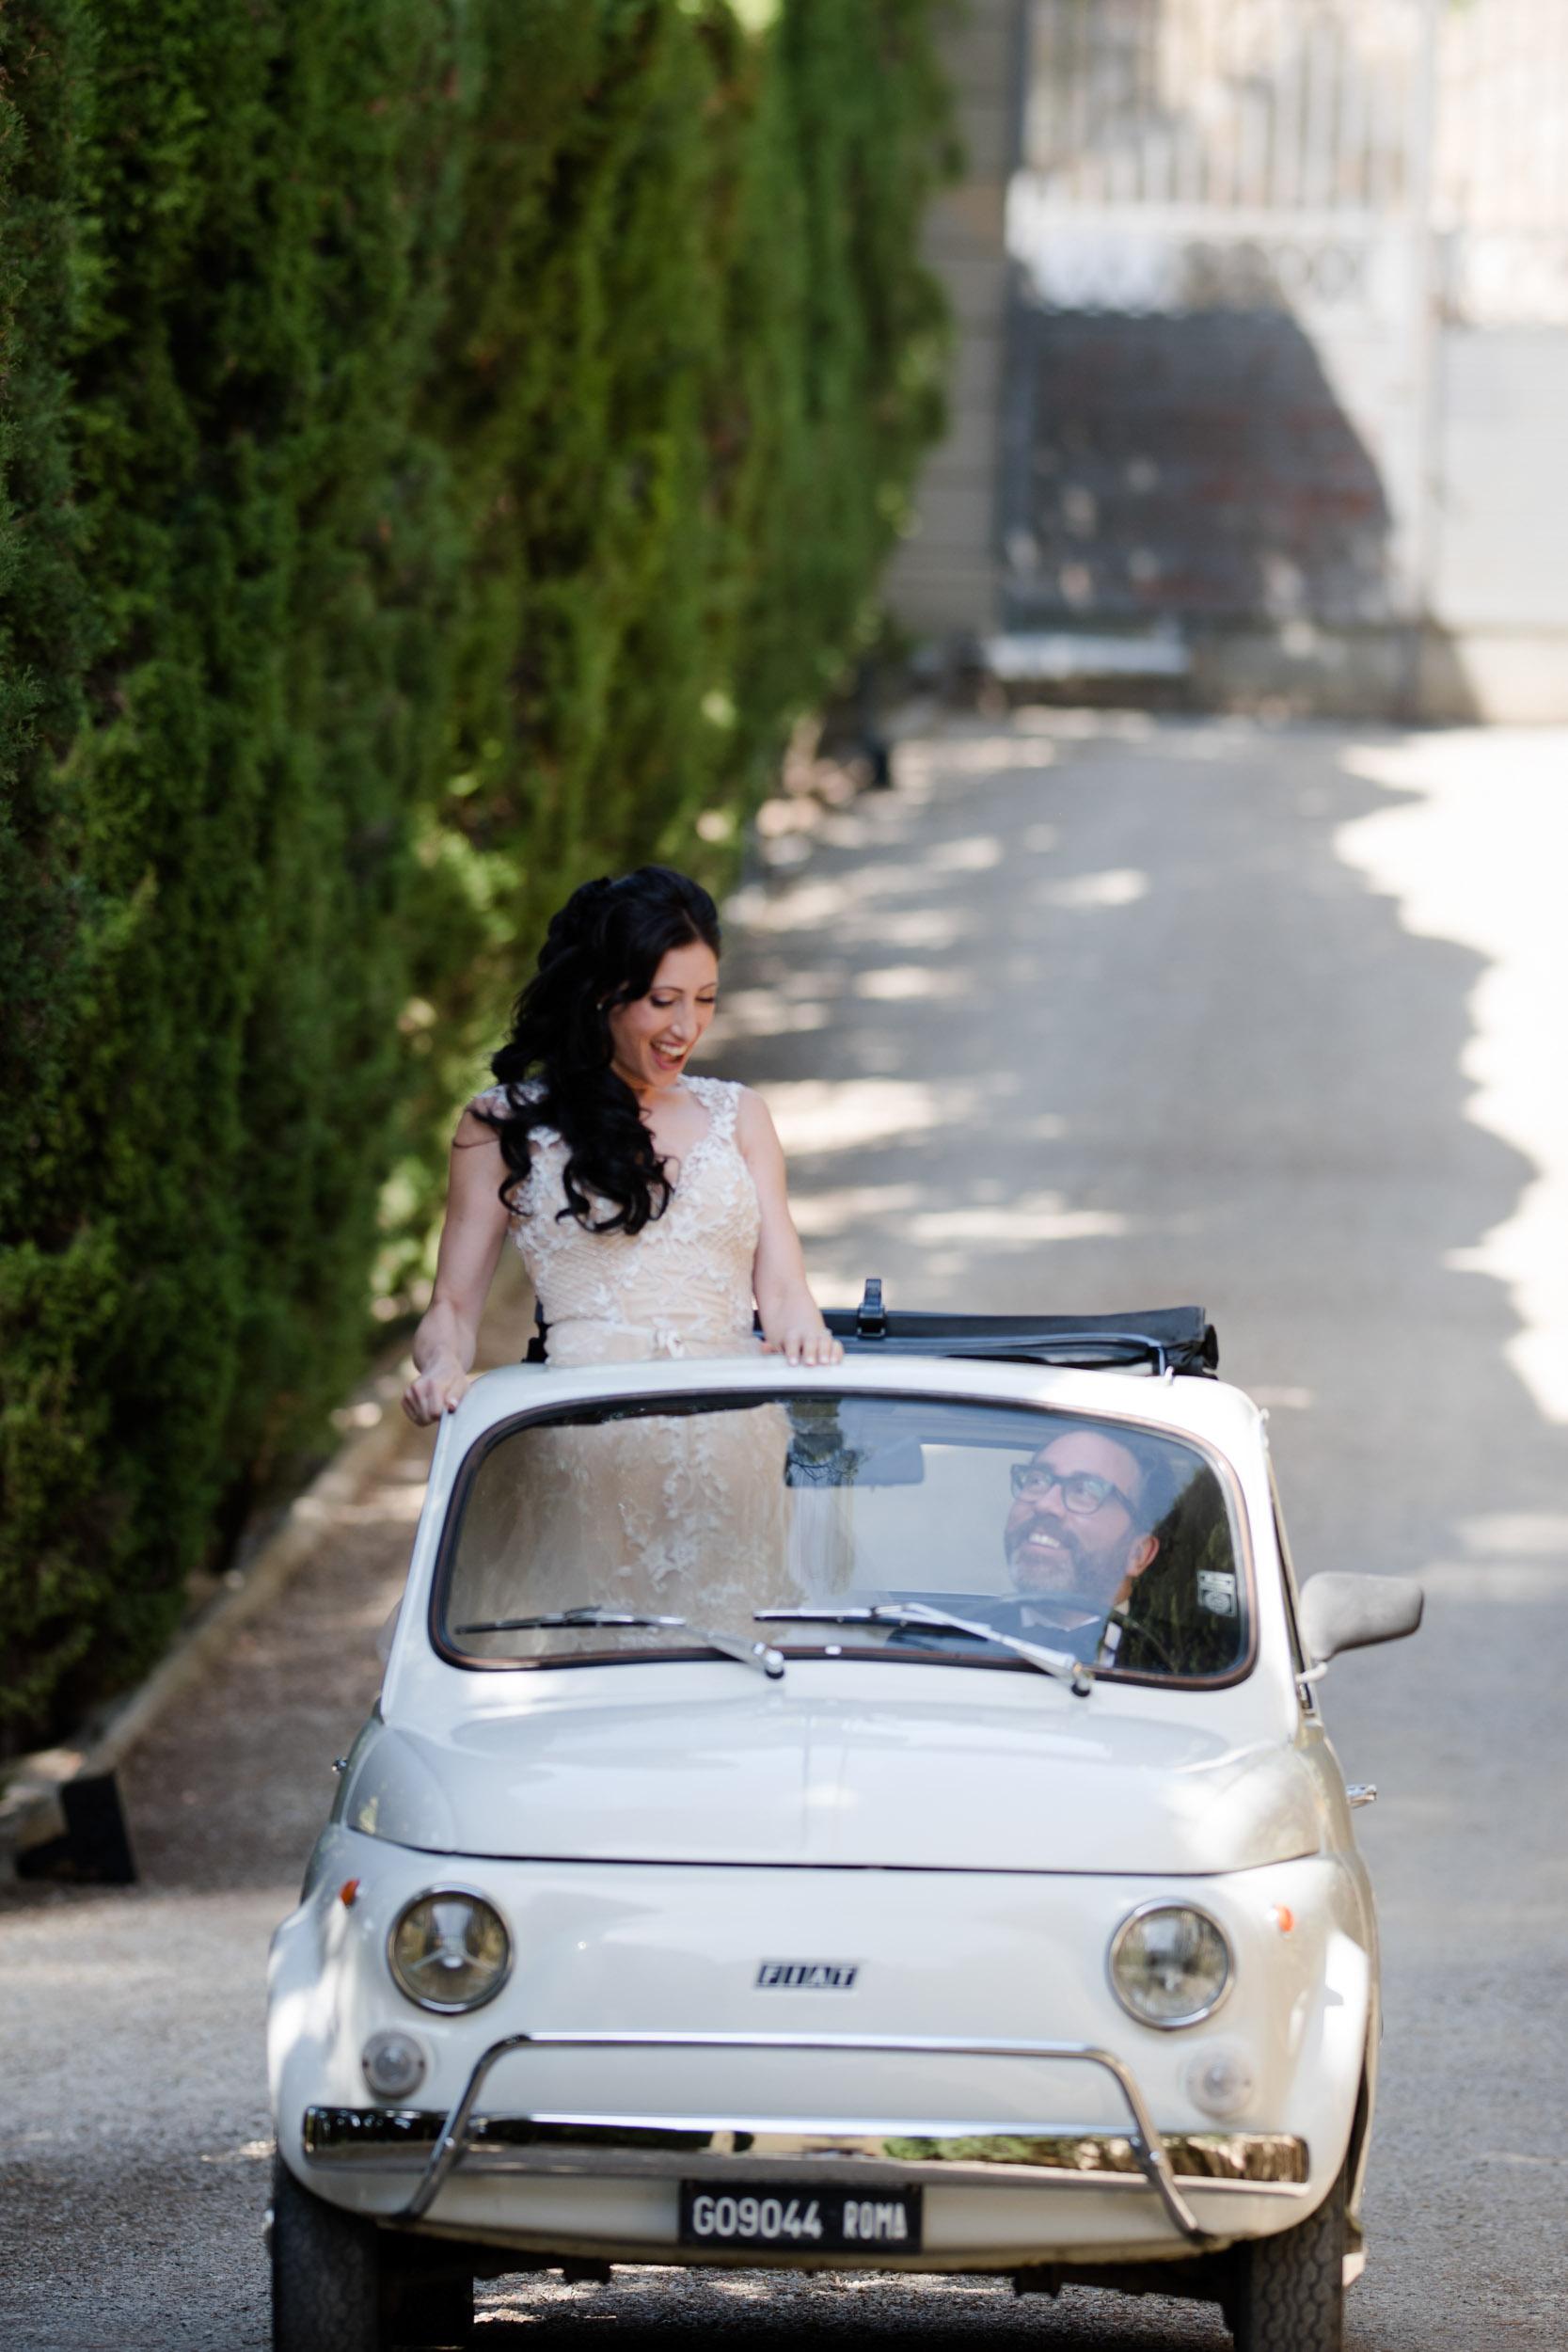 villa-gamberaia-florence-italy-destination-wedding-23.jpg